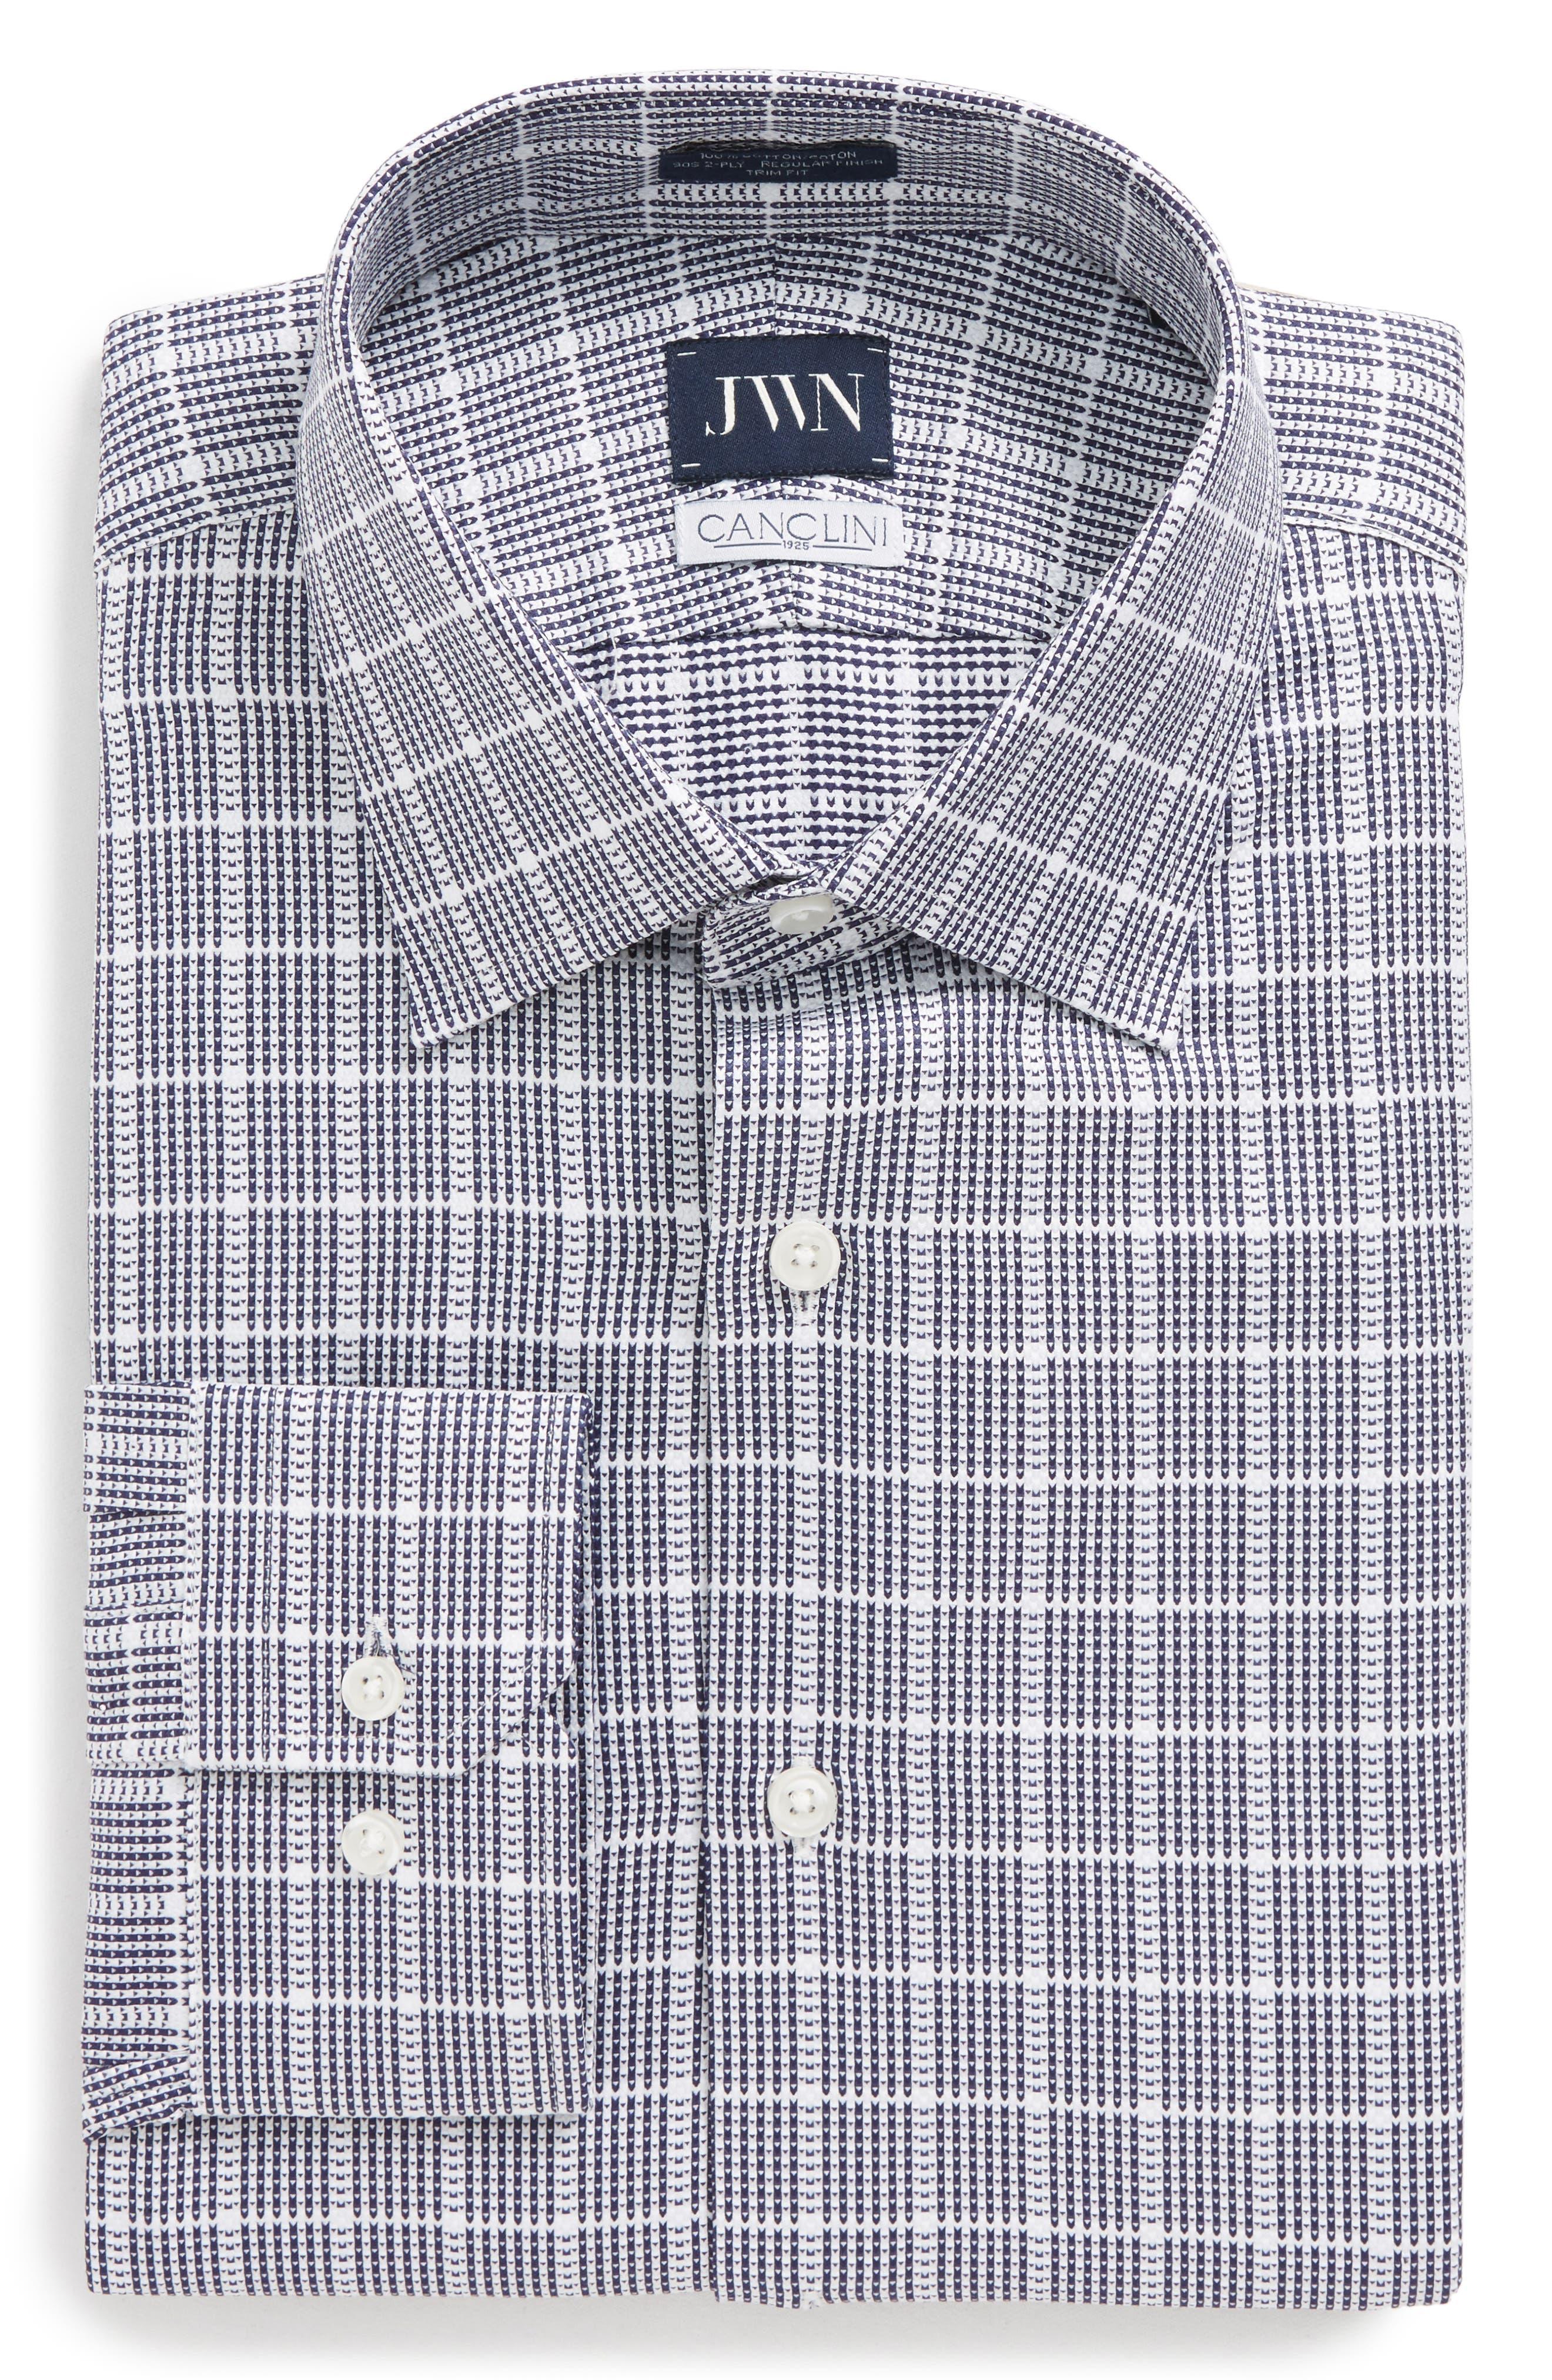 Trim Fit Check Dress Shirt,                             Main thumbnail 1, color,                             410